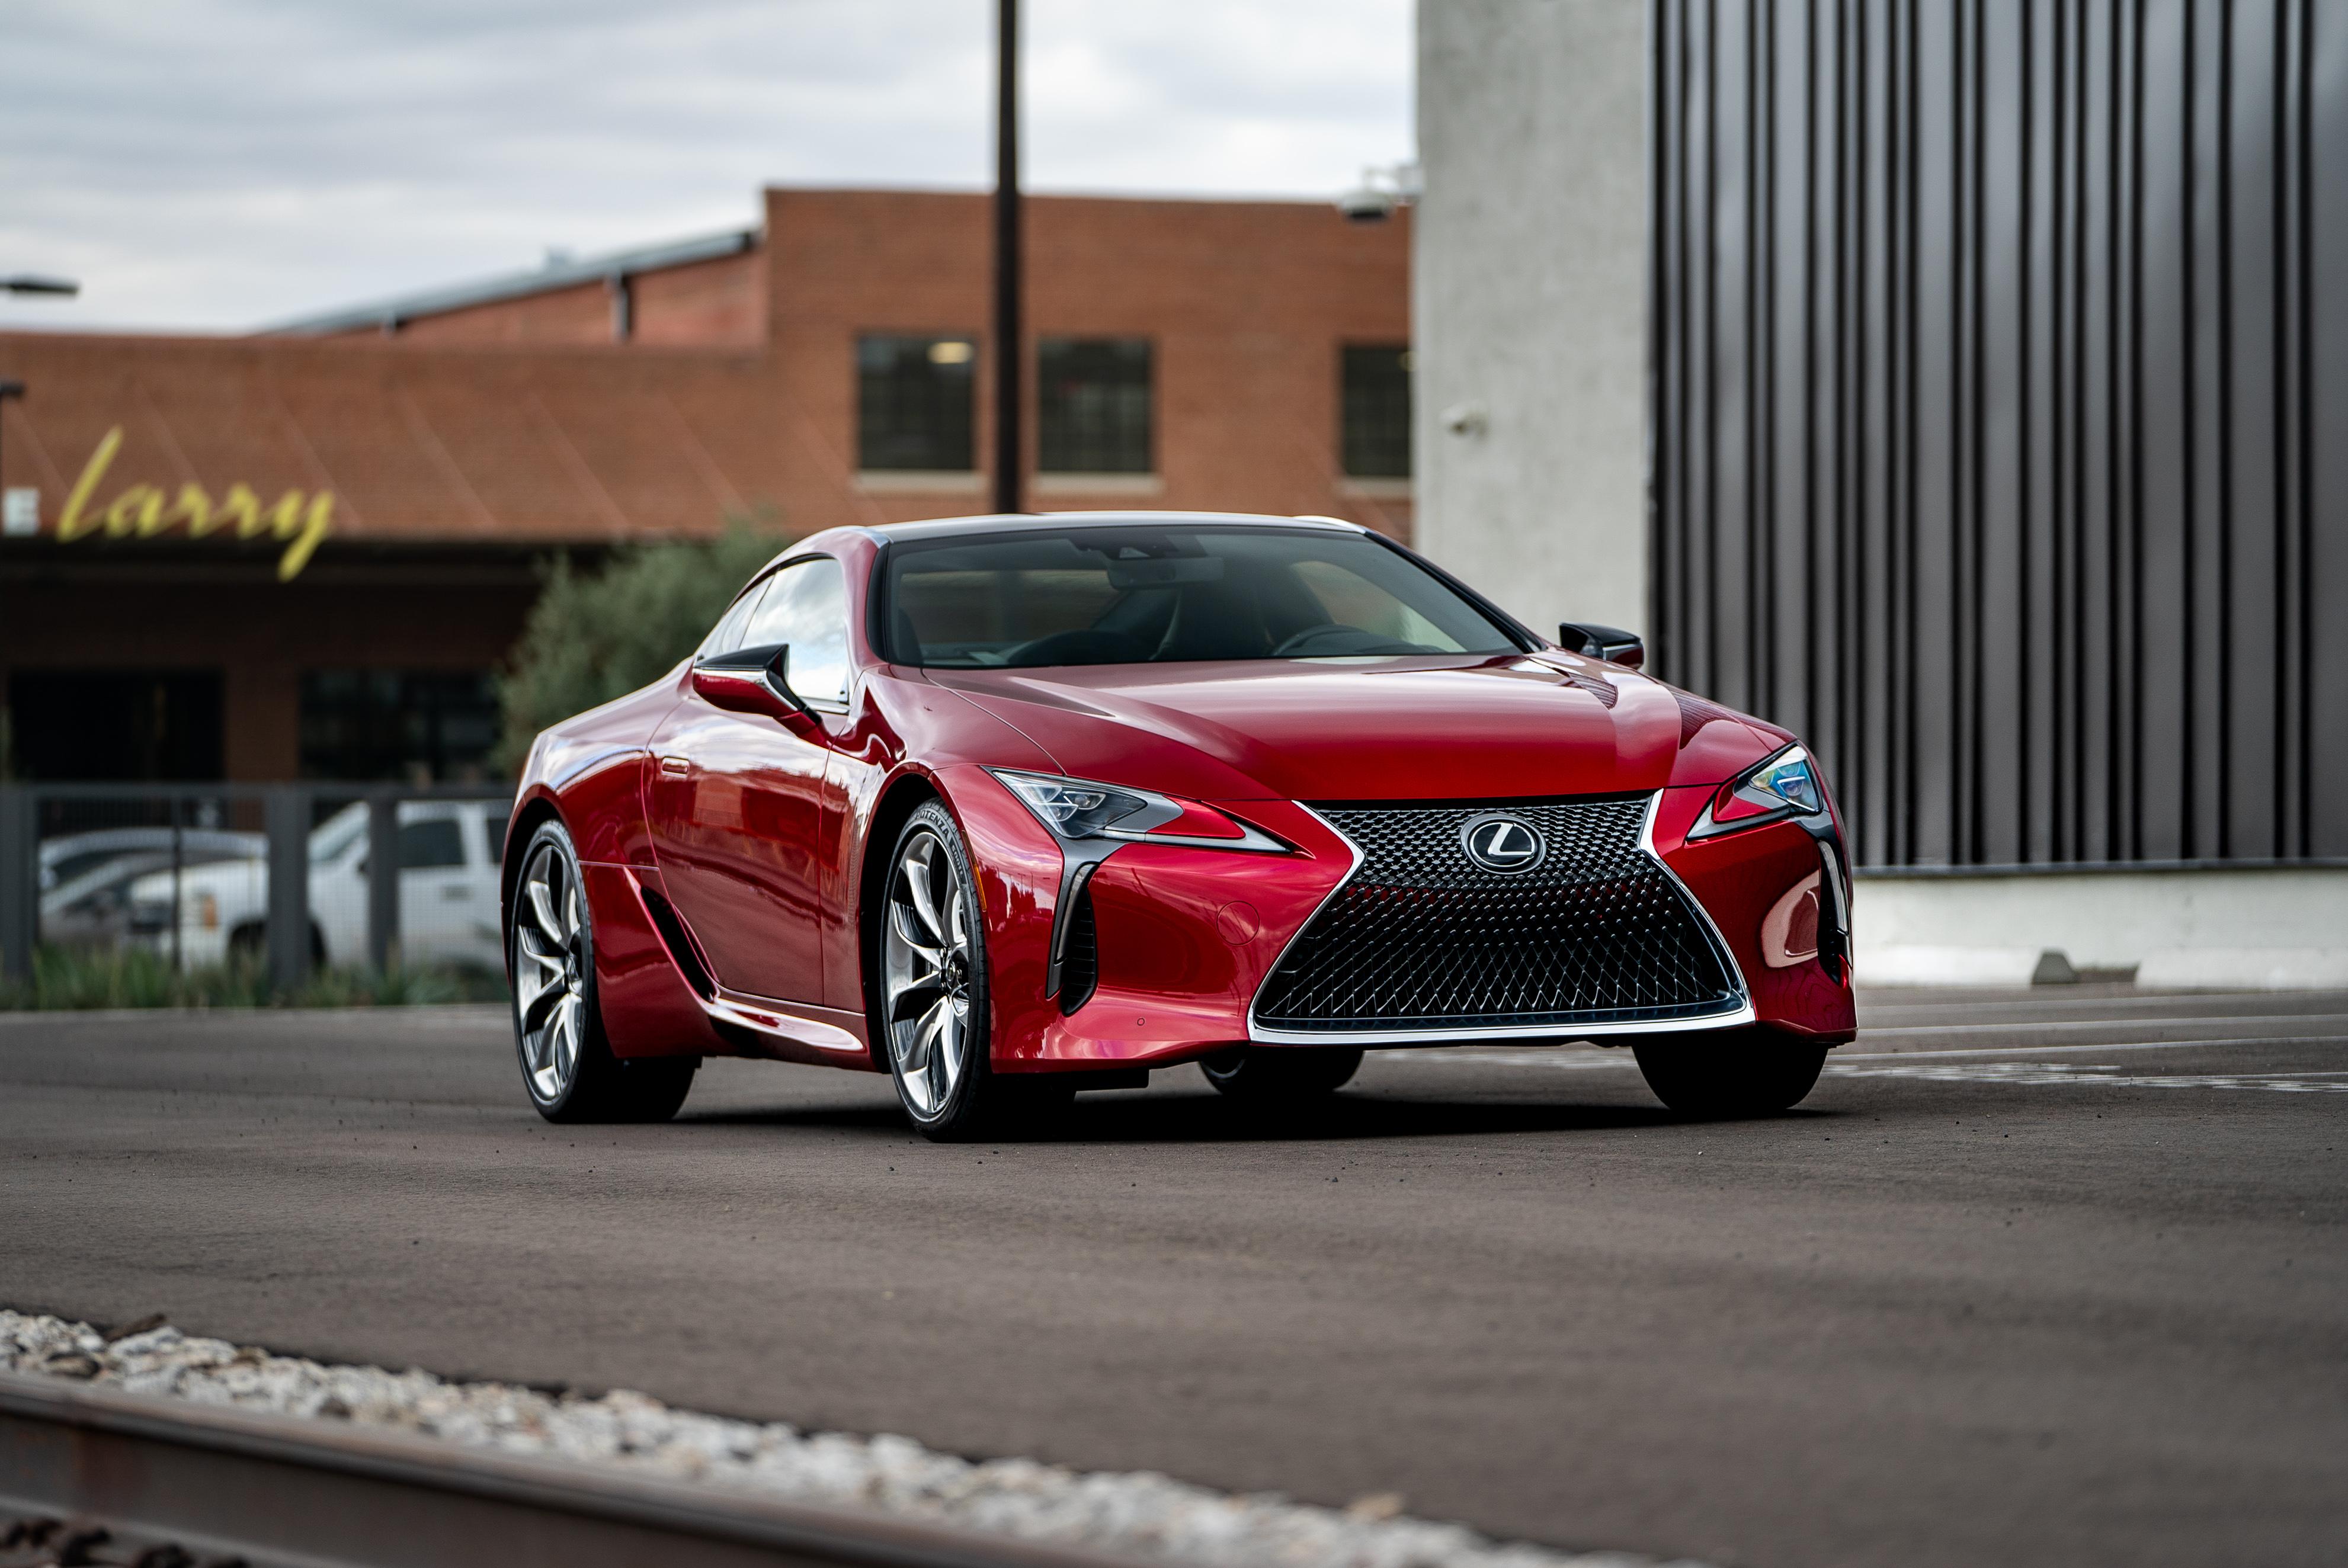 Lexus Lc 500 Price >> Driven Is Lexus Lc500 Style Worth The 100k Price Tag